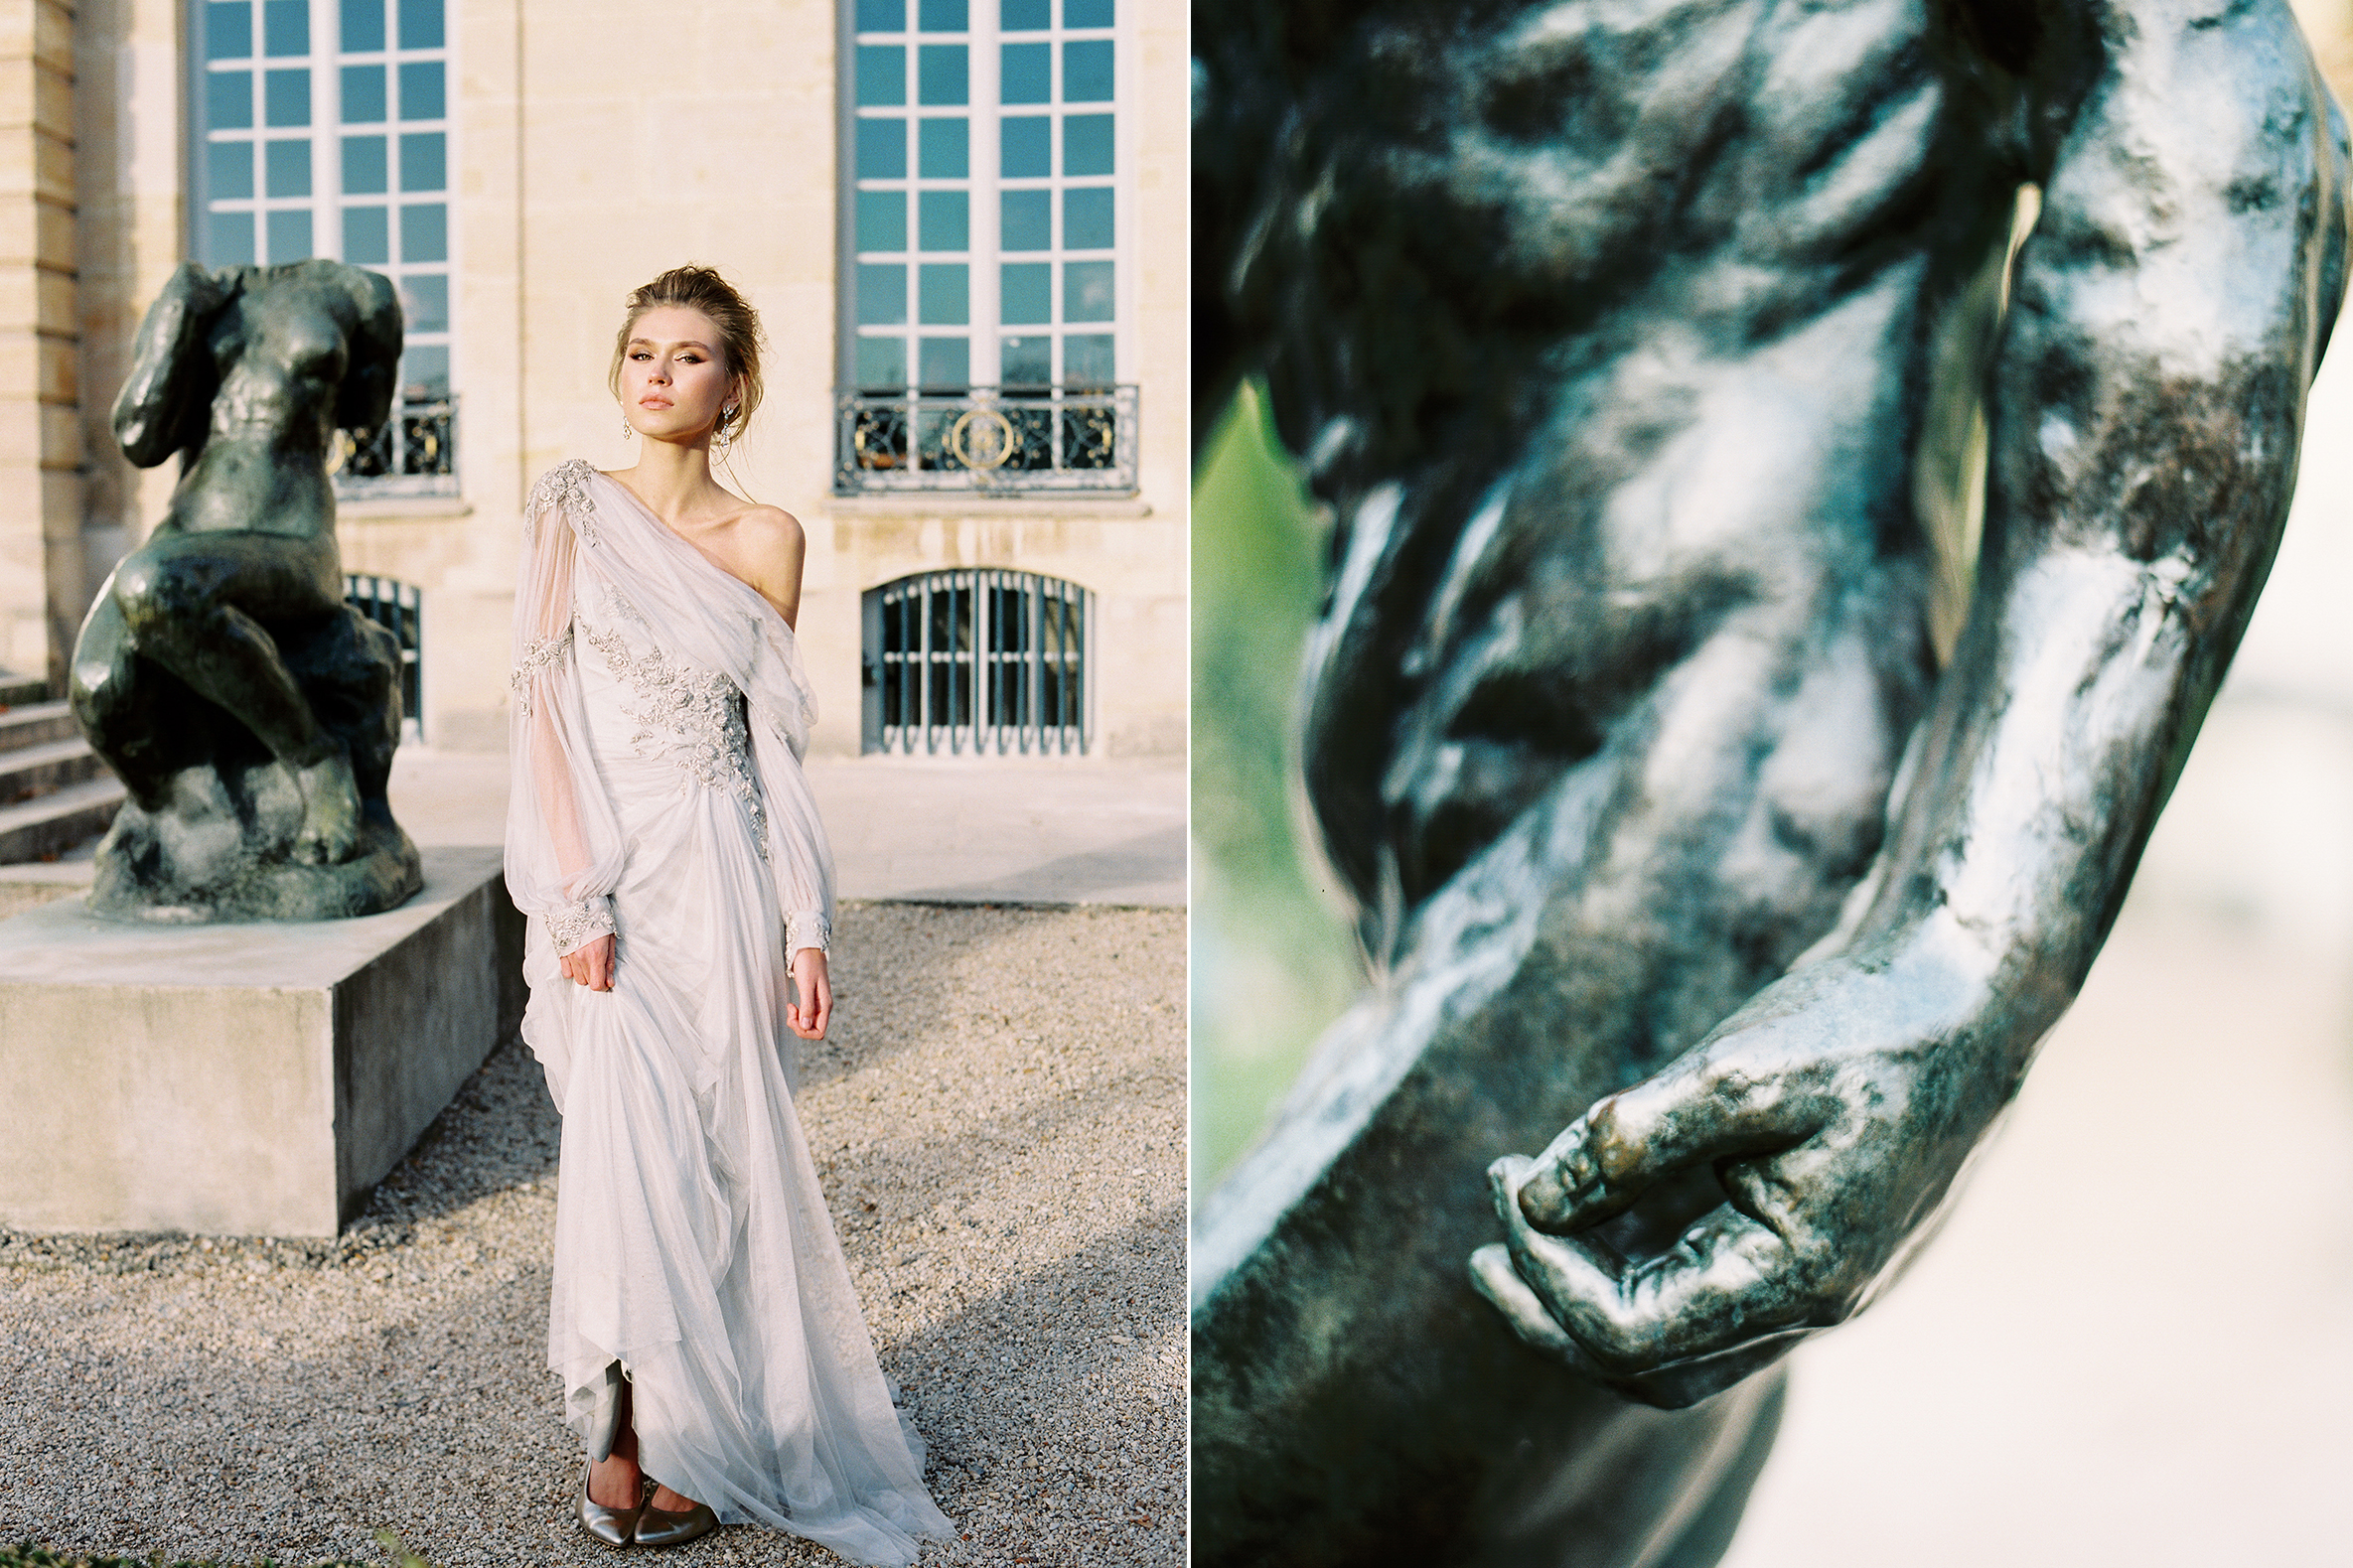 katie stoops photography-paris wedding-marchesa-cynthia martyn events23.jpg